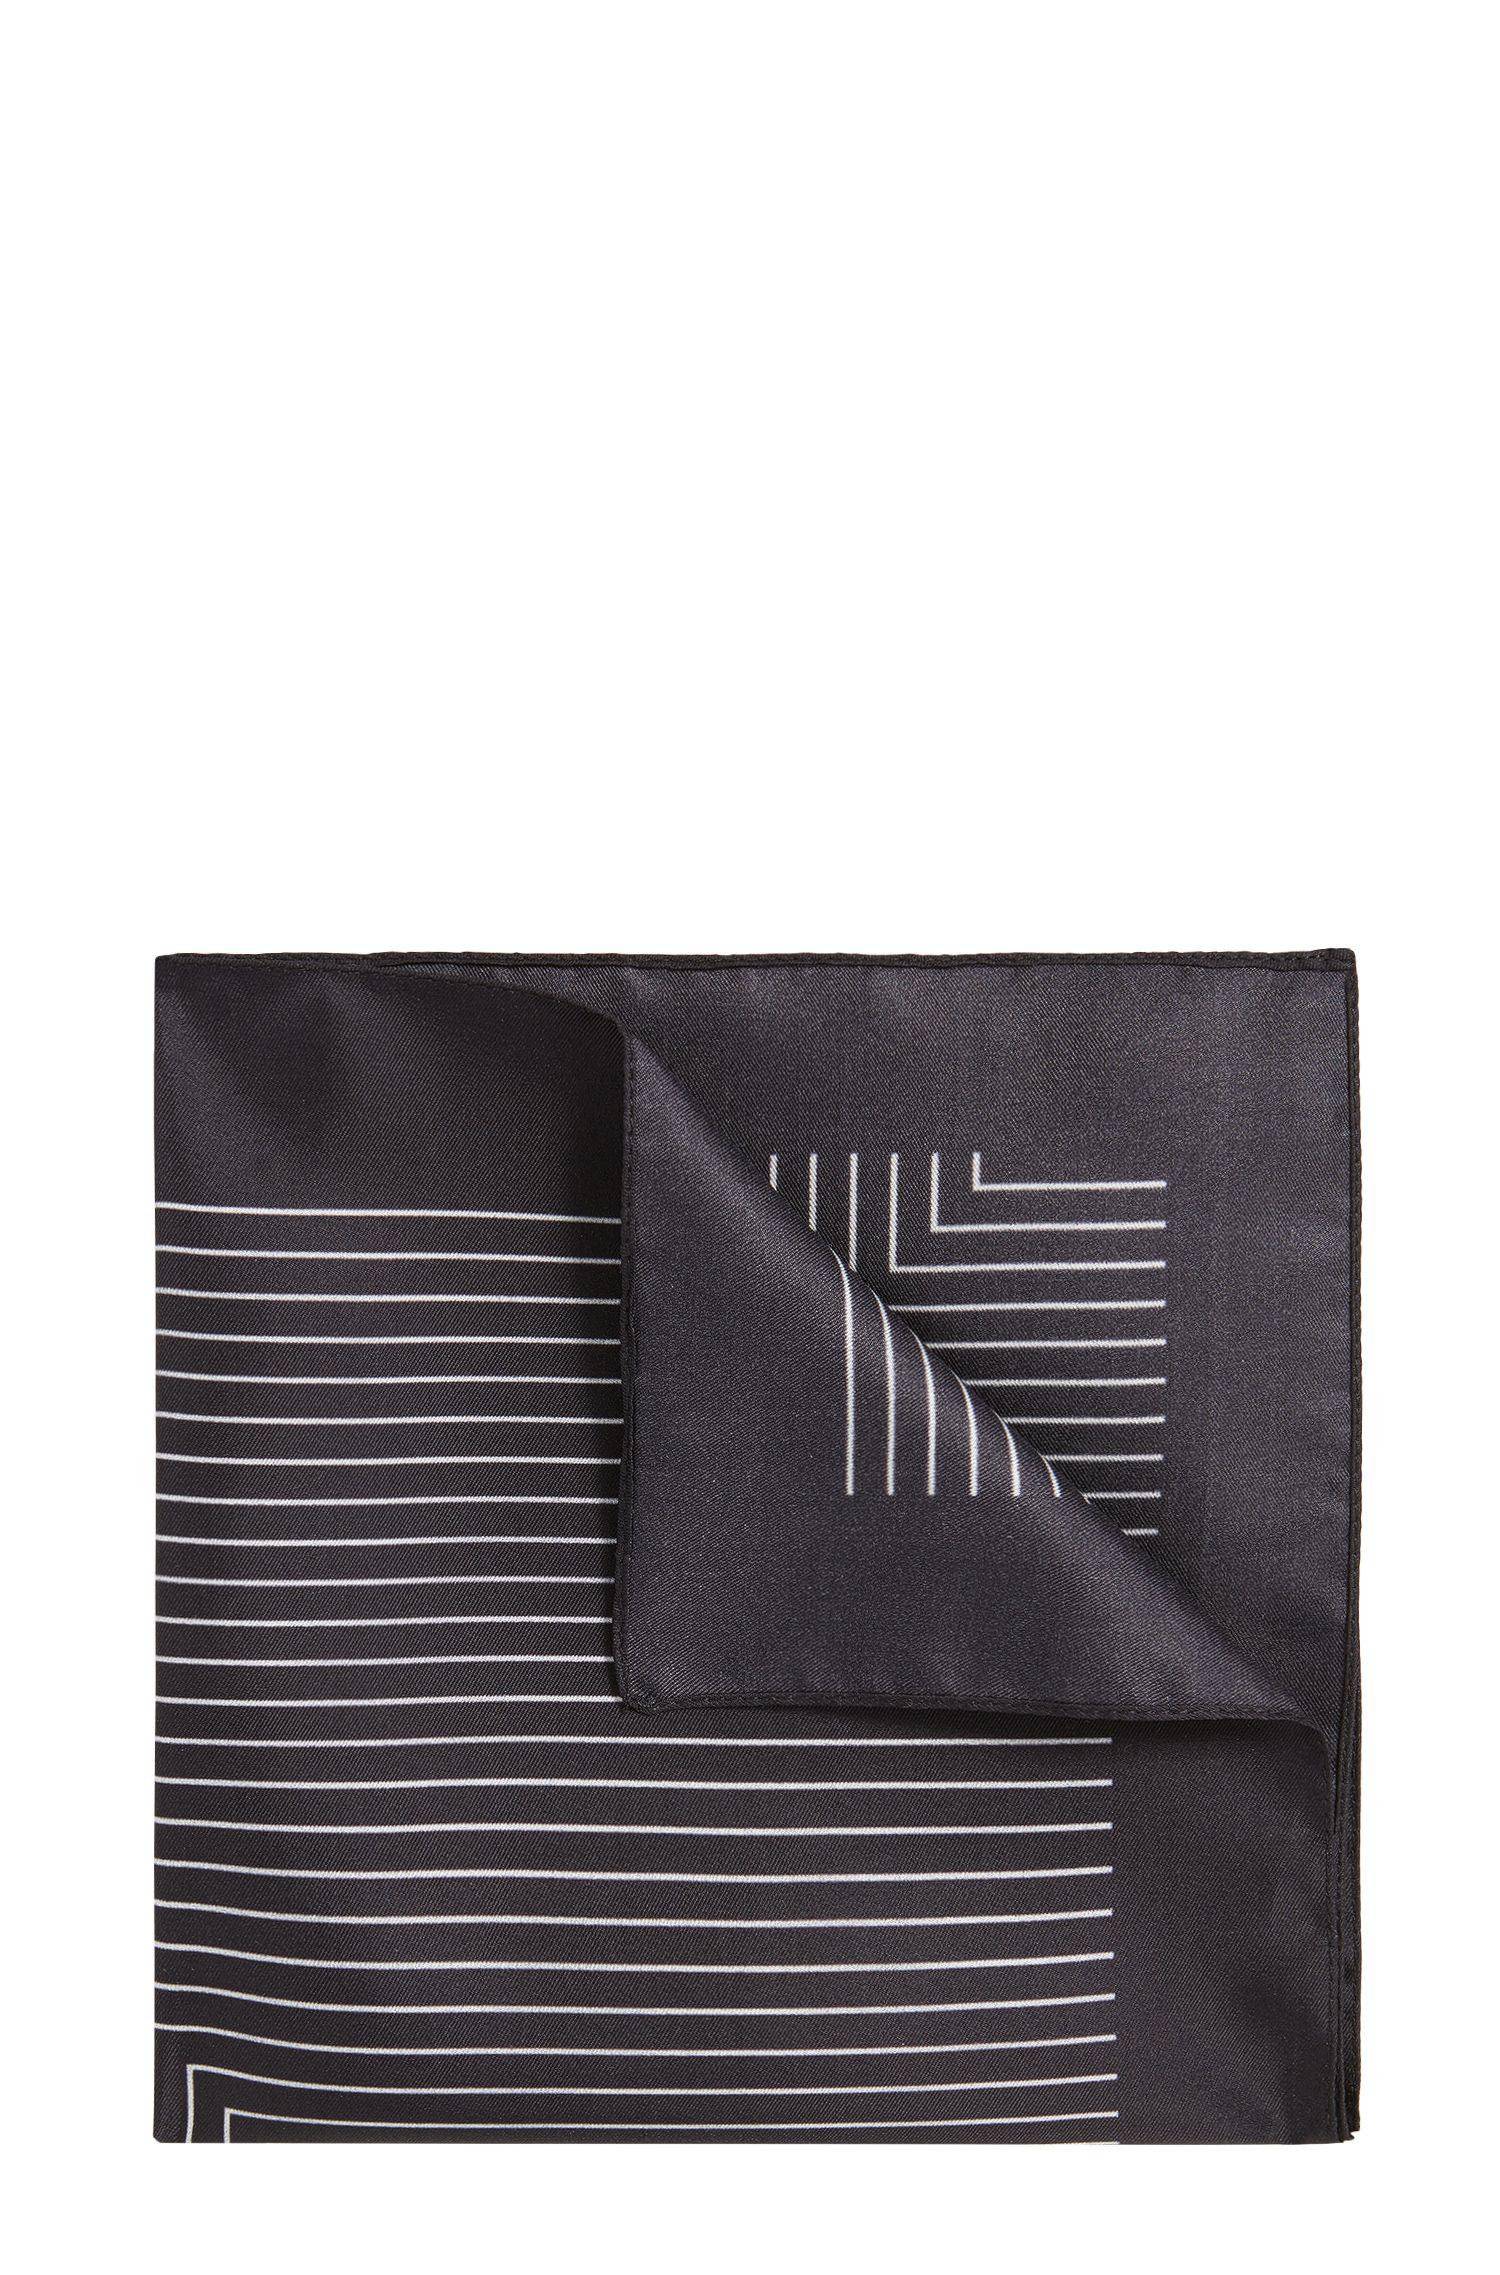 Striped Silk Pocket Square | Pocket sq. cm 33x33